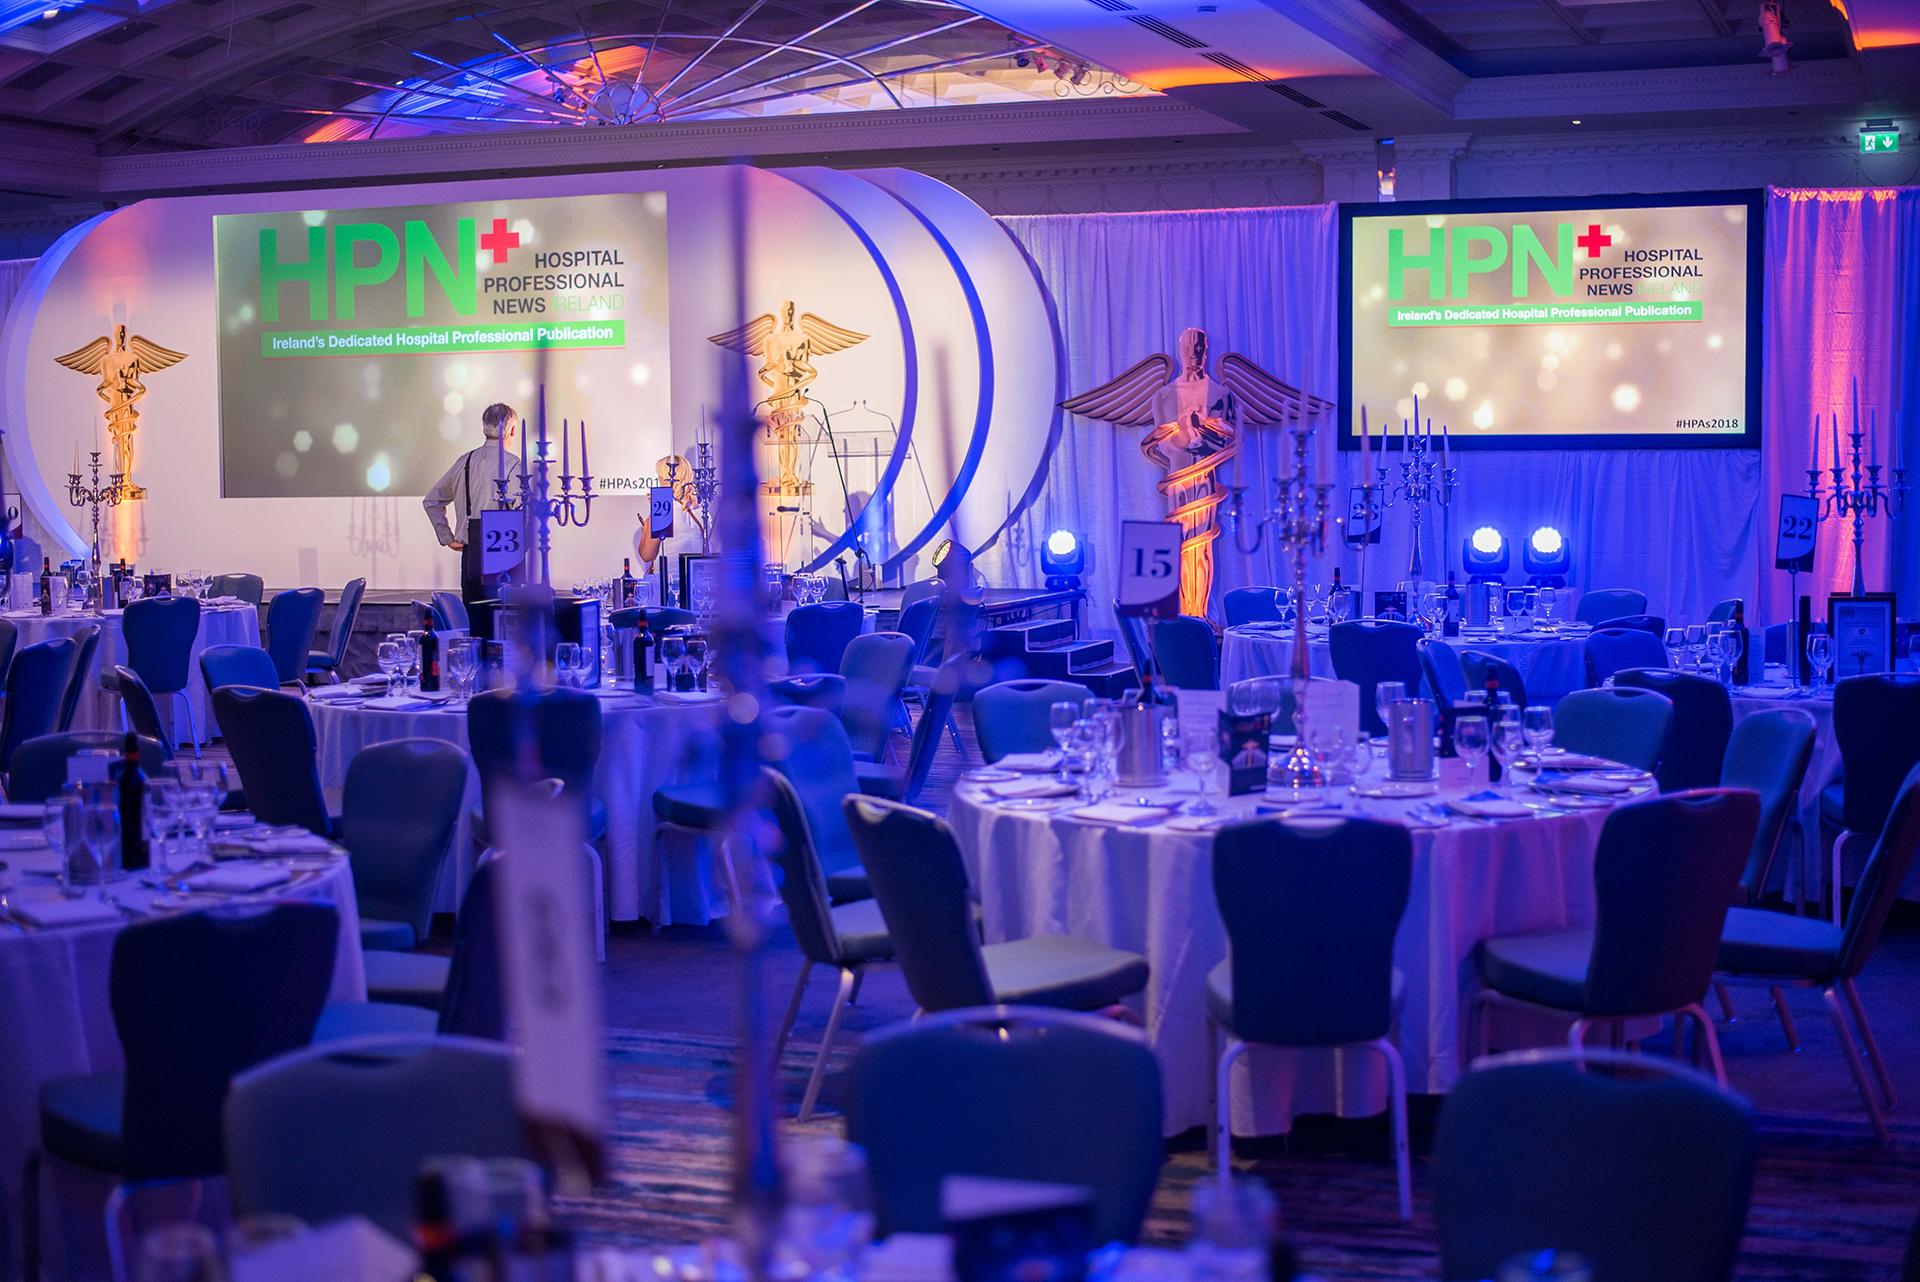 Hospital Professional Awards 2018